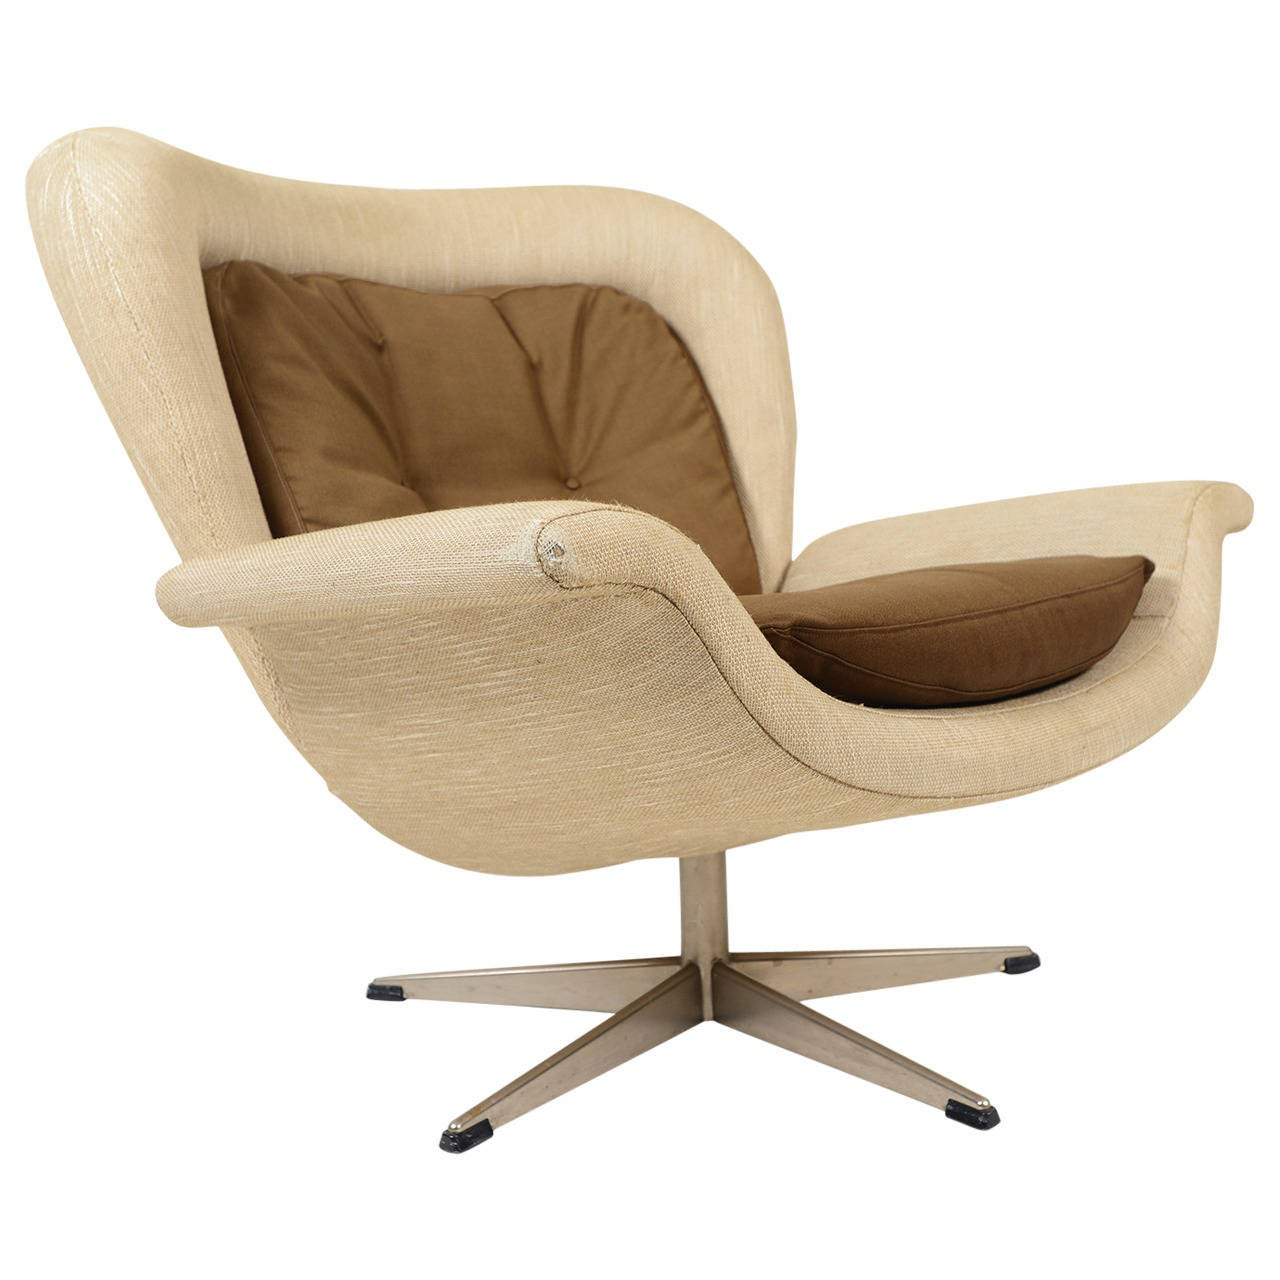 John Mortensen Prototype Swivel Lounge Chair At 1stdibs